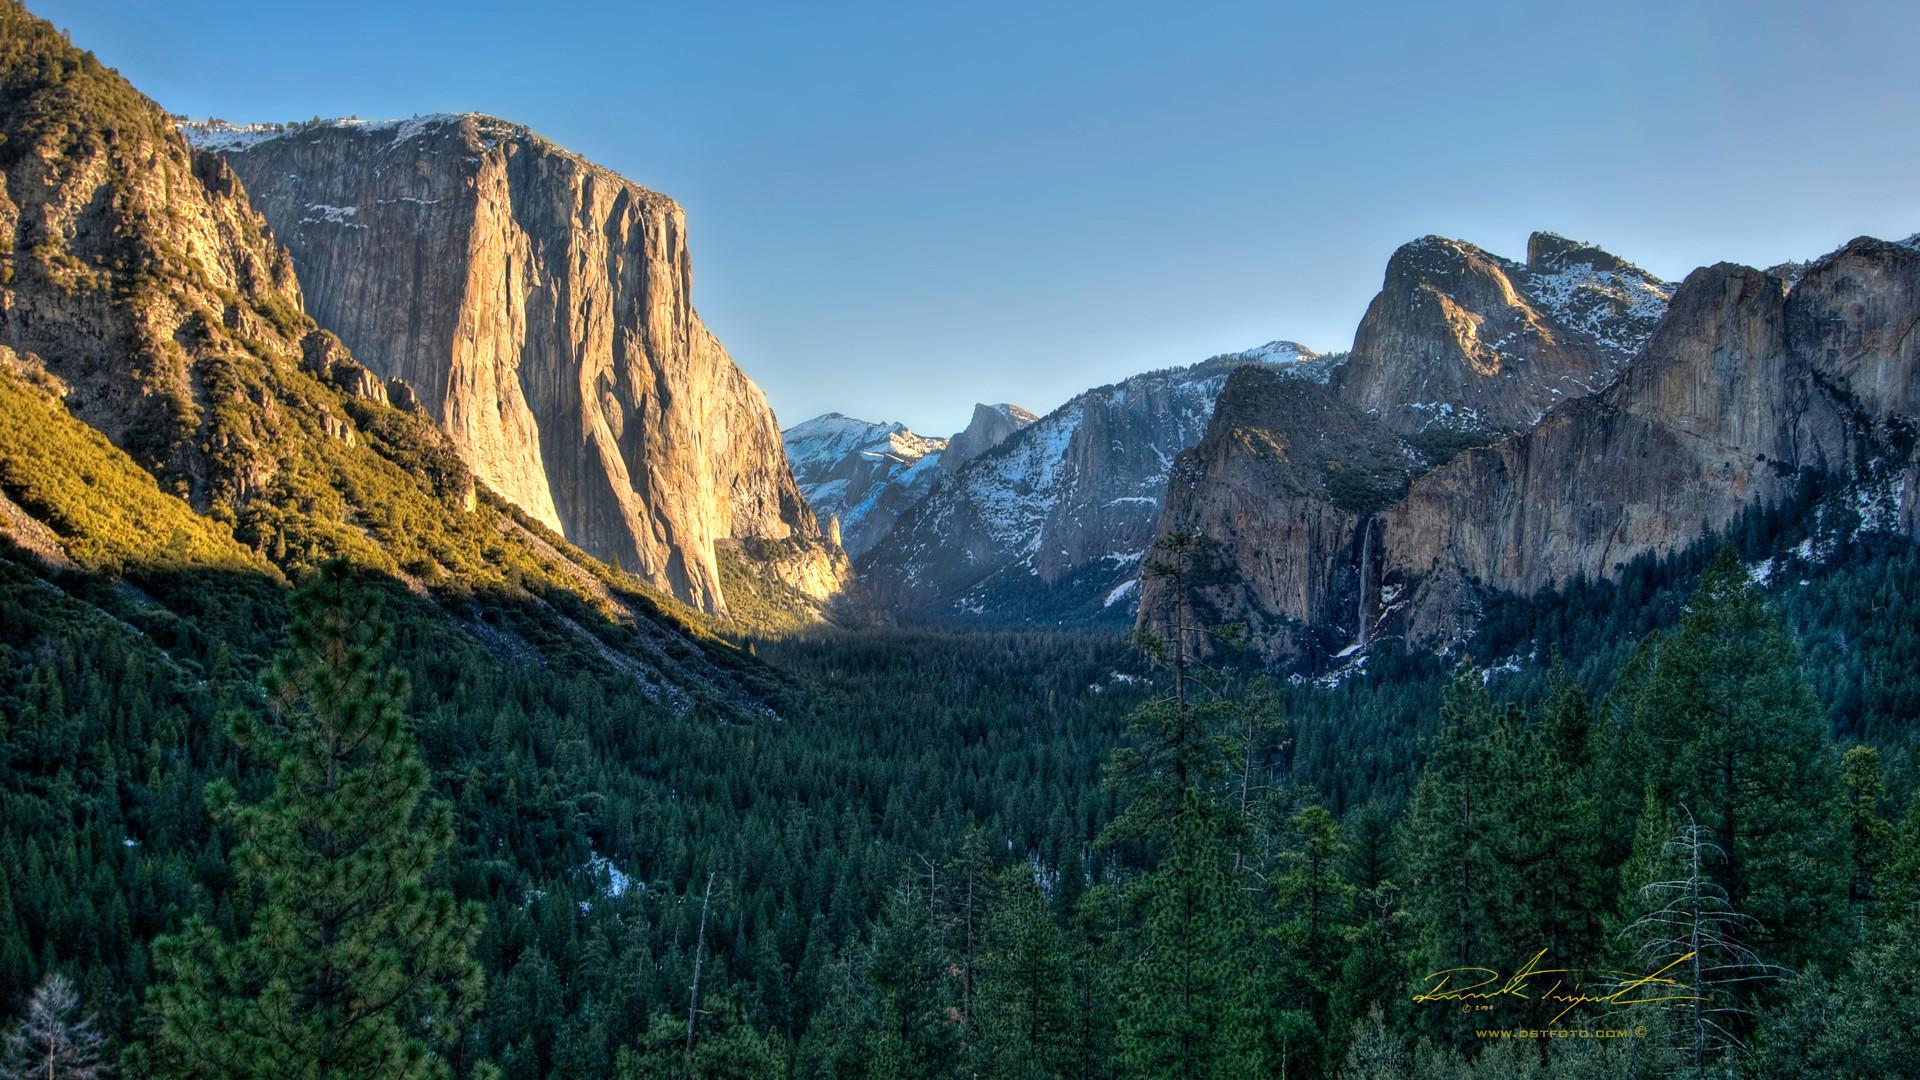 Yosemite National Park Wallpaper HD